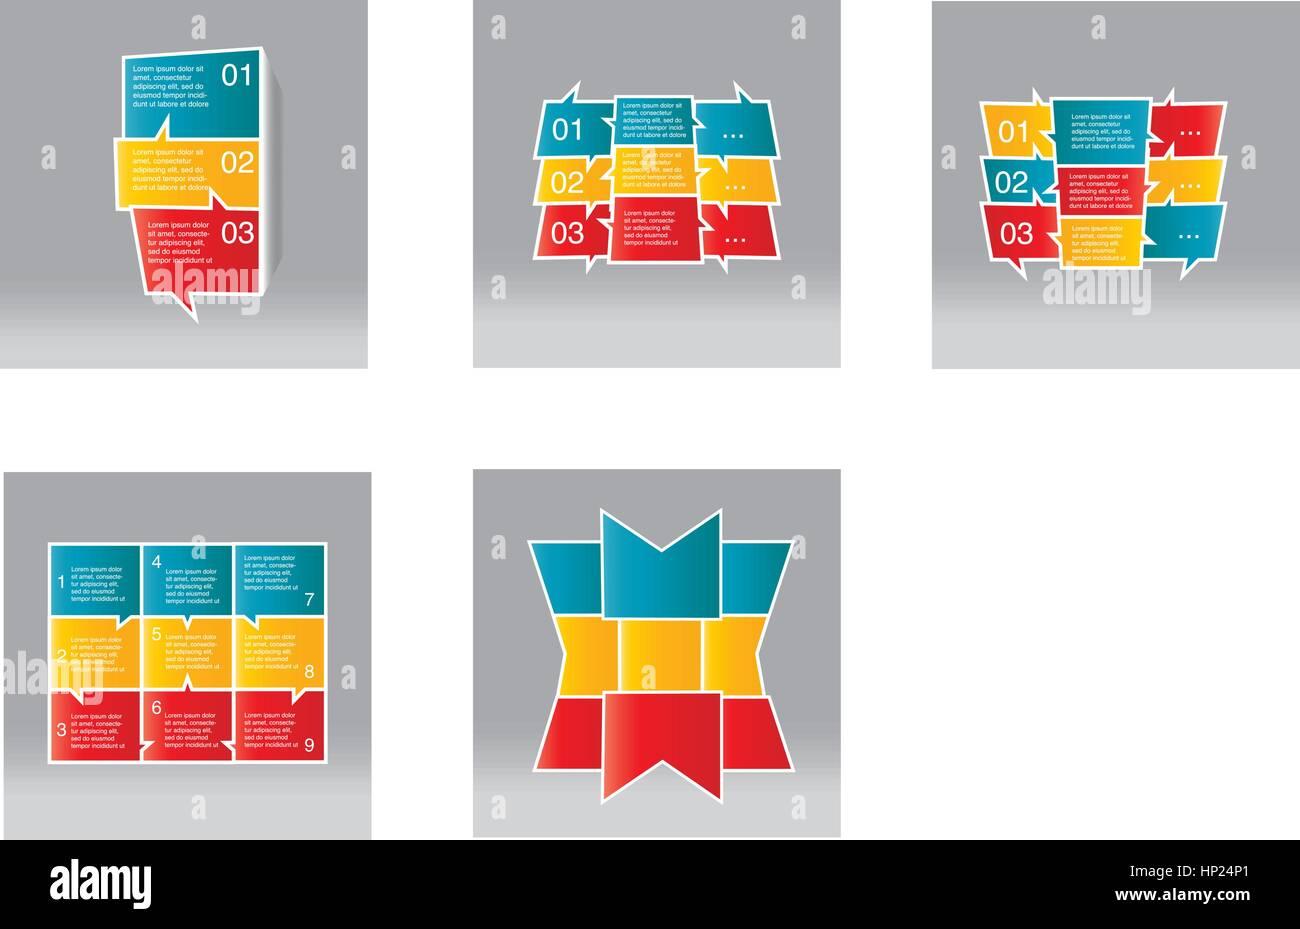 Infographic - Stock Vector